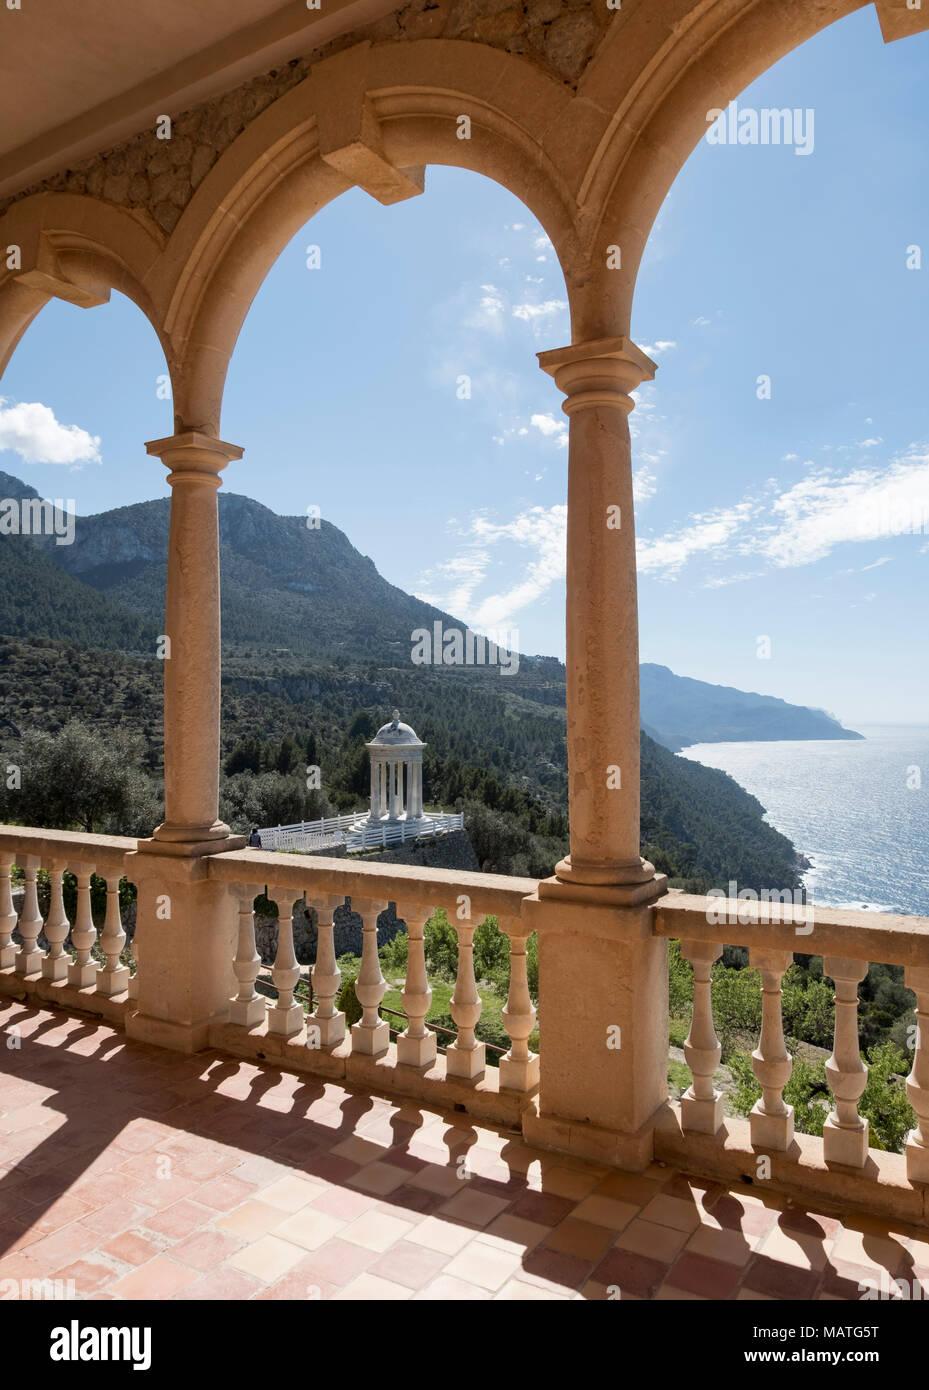 Mallorca, Finca Son Marriog bei Valldemossa, Blick von der Terrasse auf den Marmorpavillon Stockbild